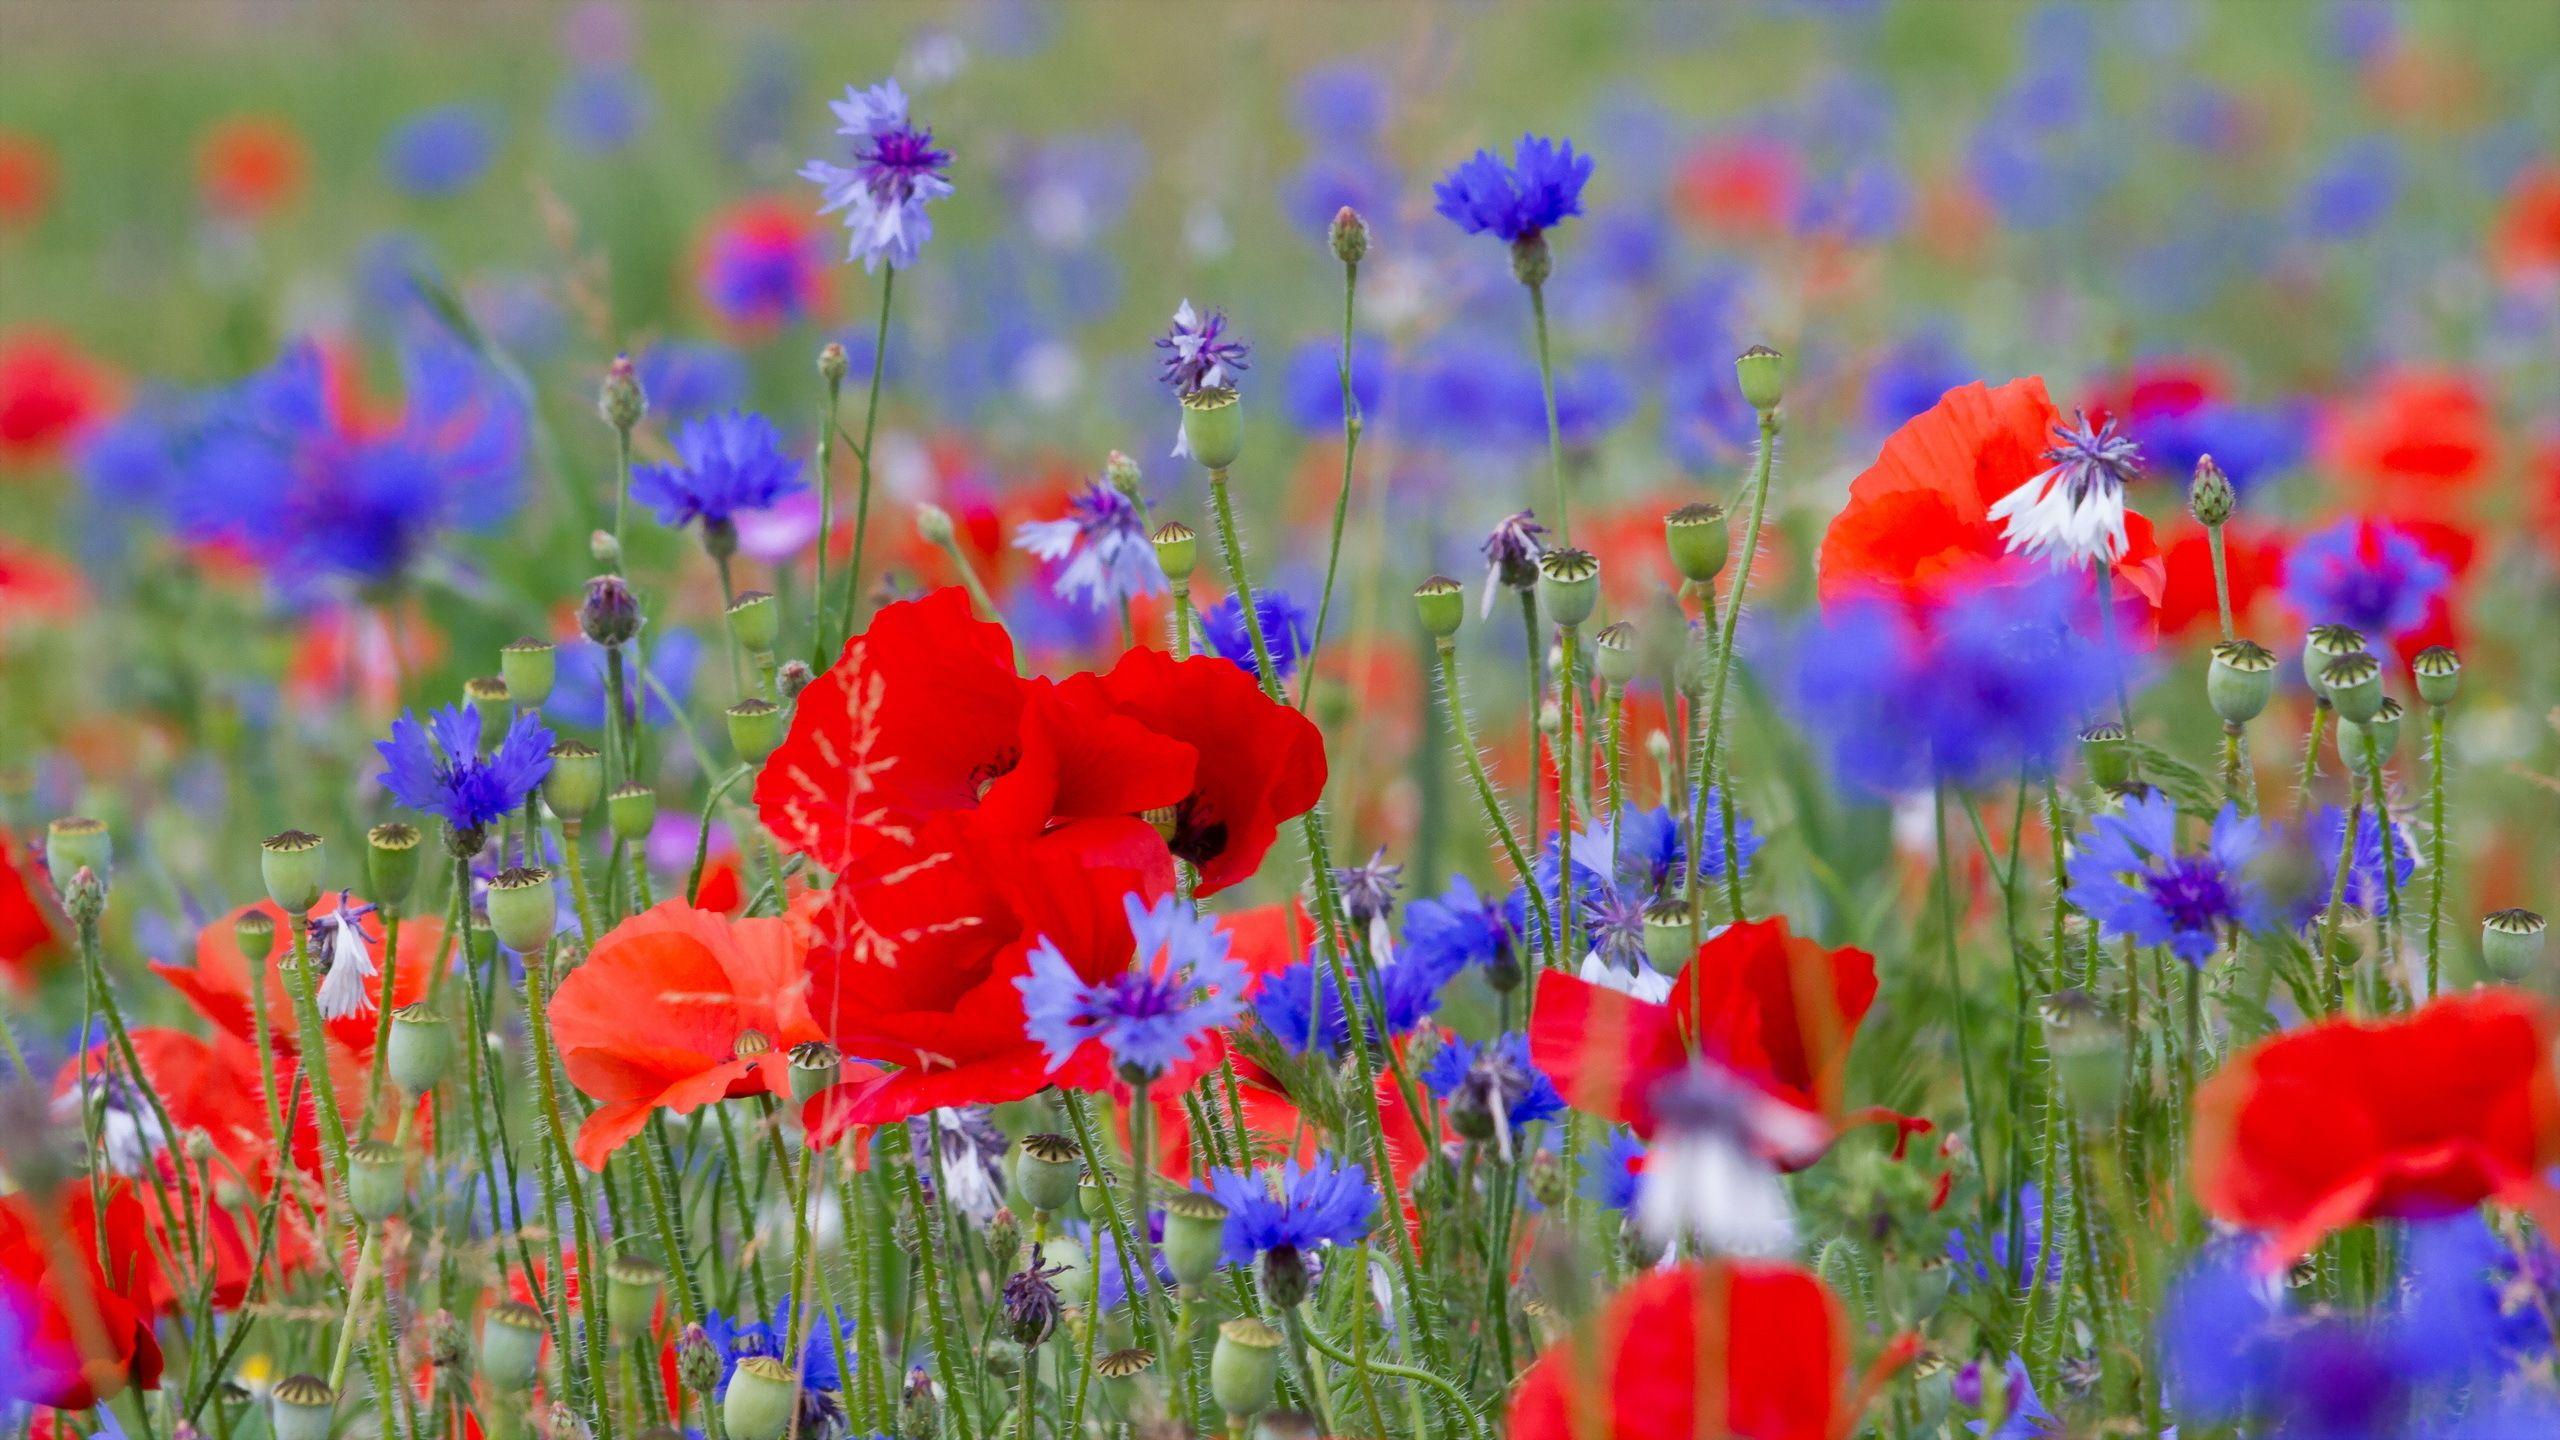 Wild Flowers Desktop Background Wallpapers Hd Free 341130 Flower Wallpaper Flower Landscape Flowers